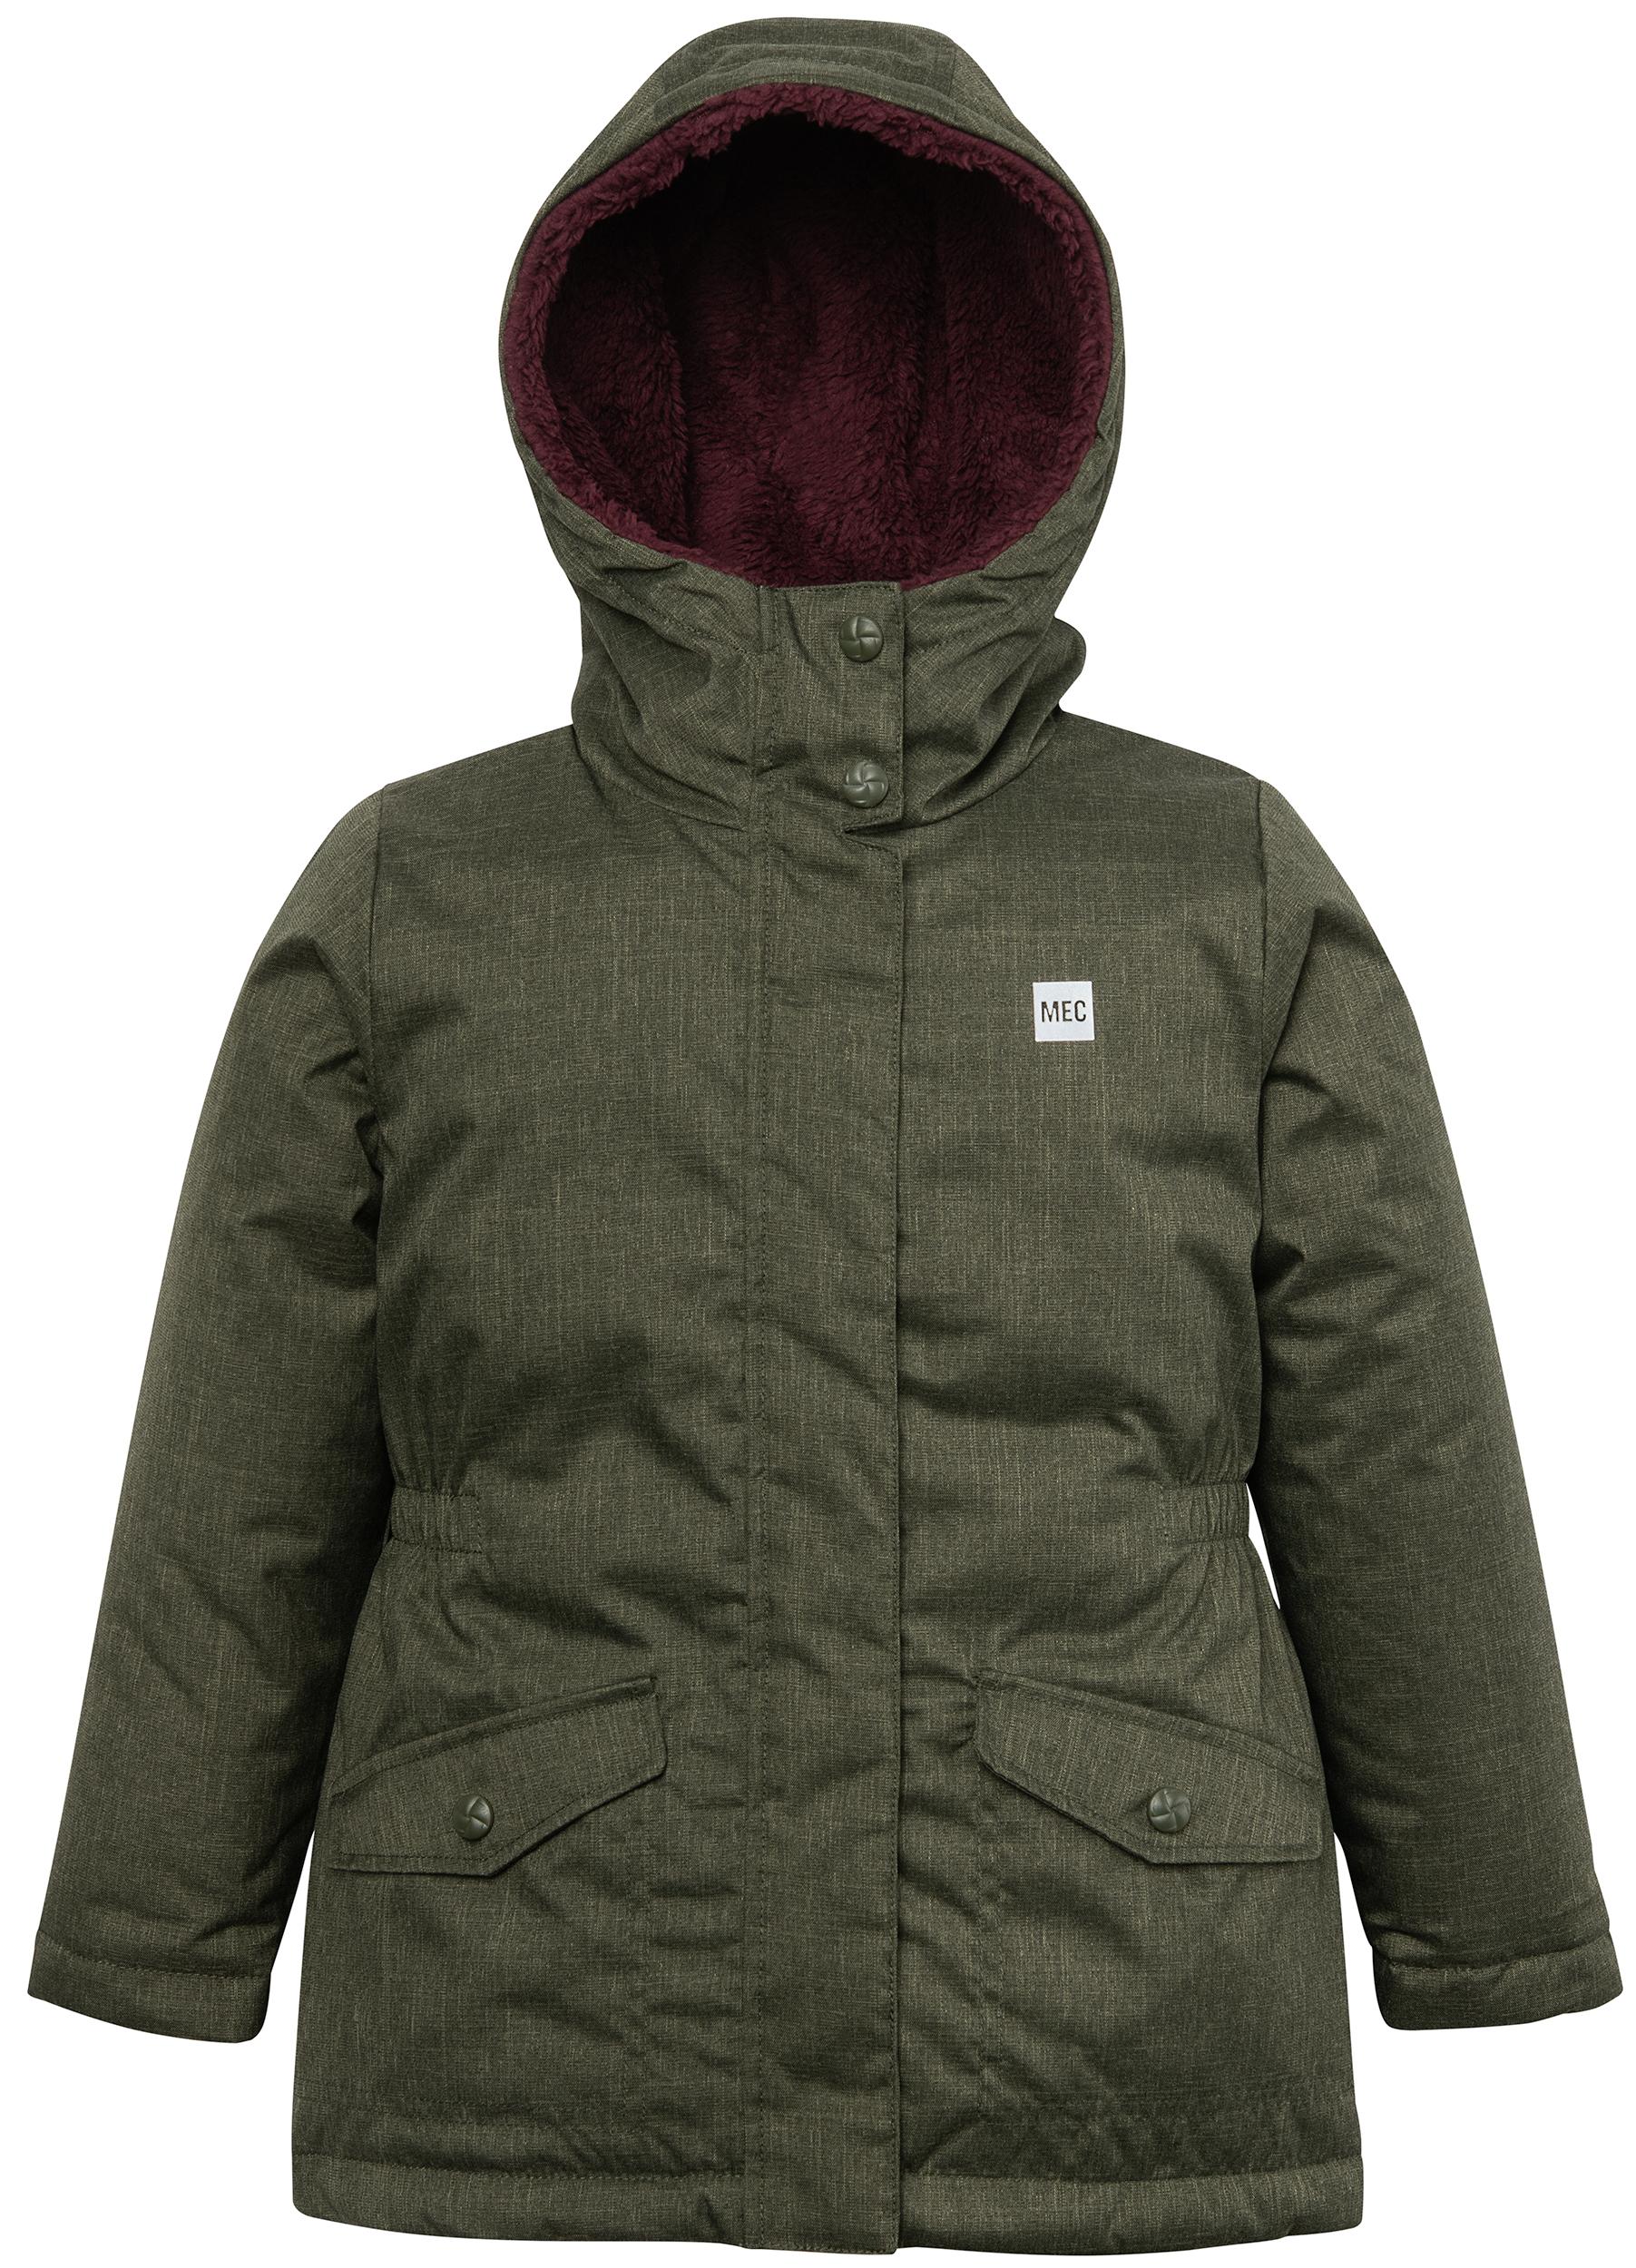 55c831884e88 Parkas and winter coats